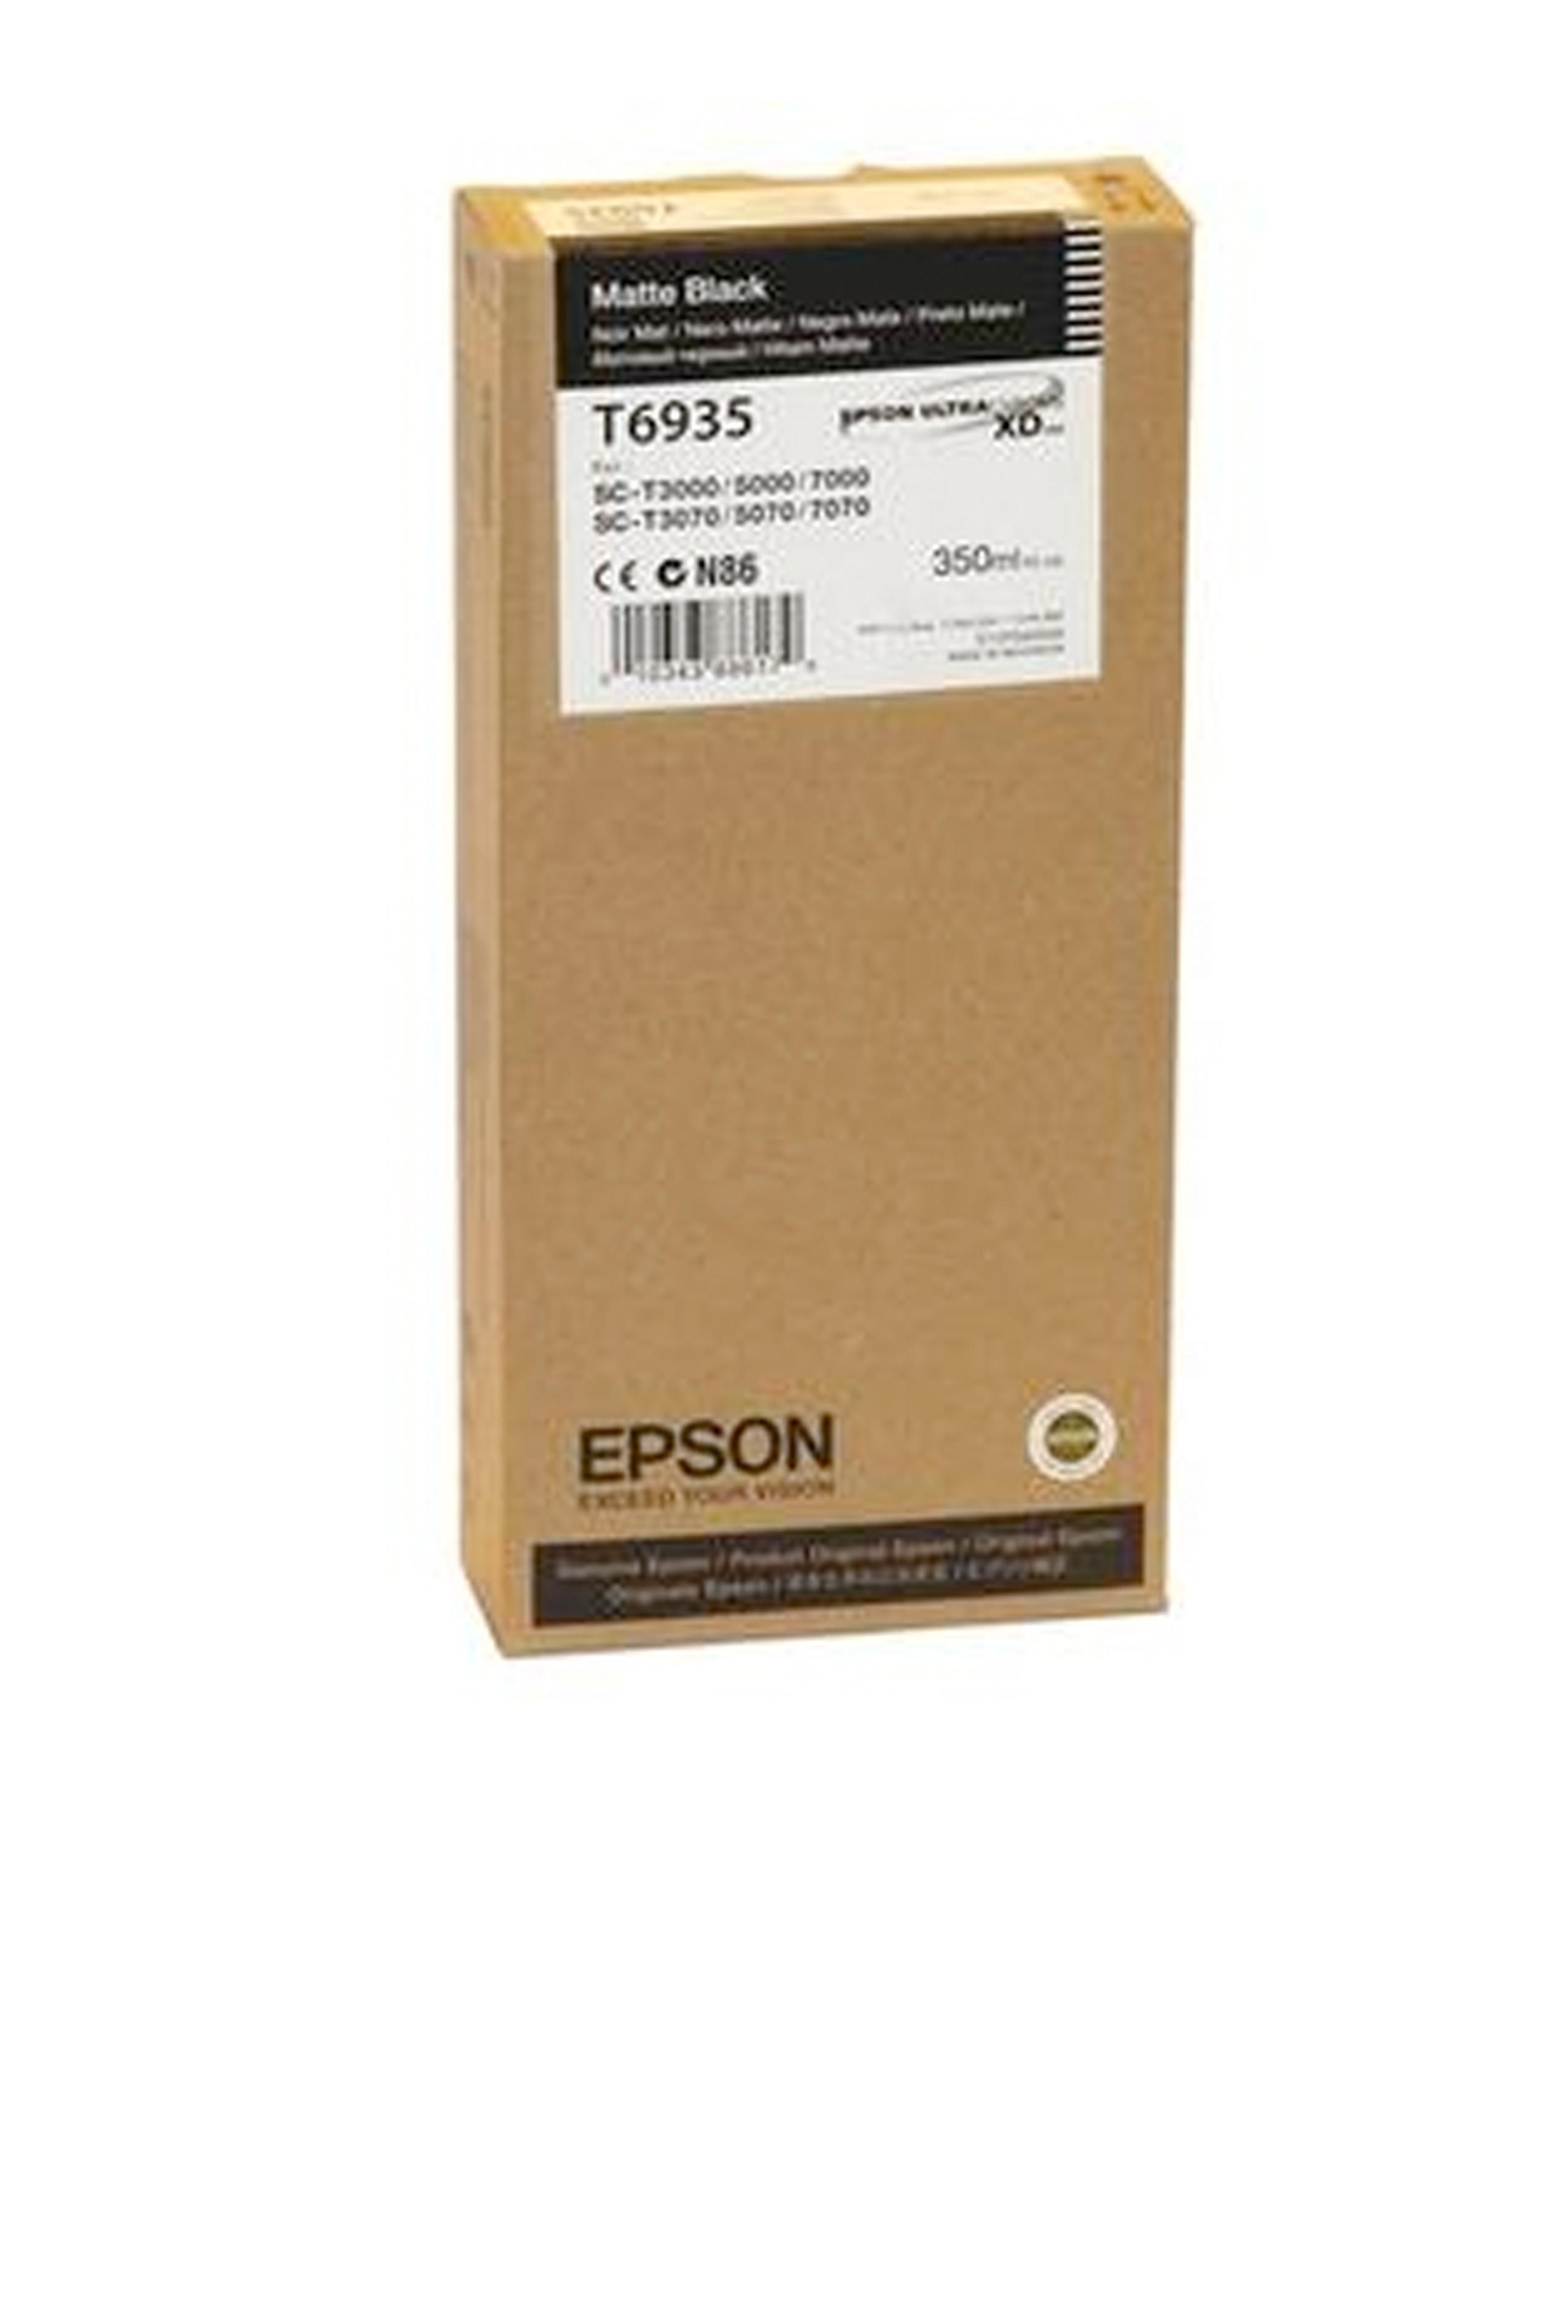 Epson EPSON SD MATTE BLACK INK (350 ML) (T693500)